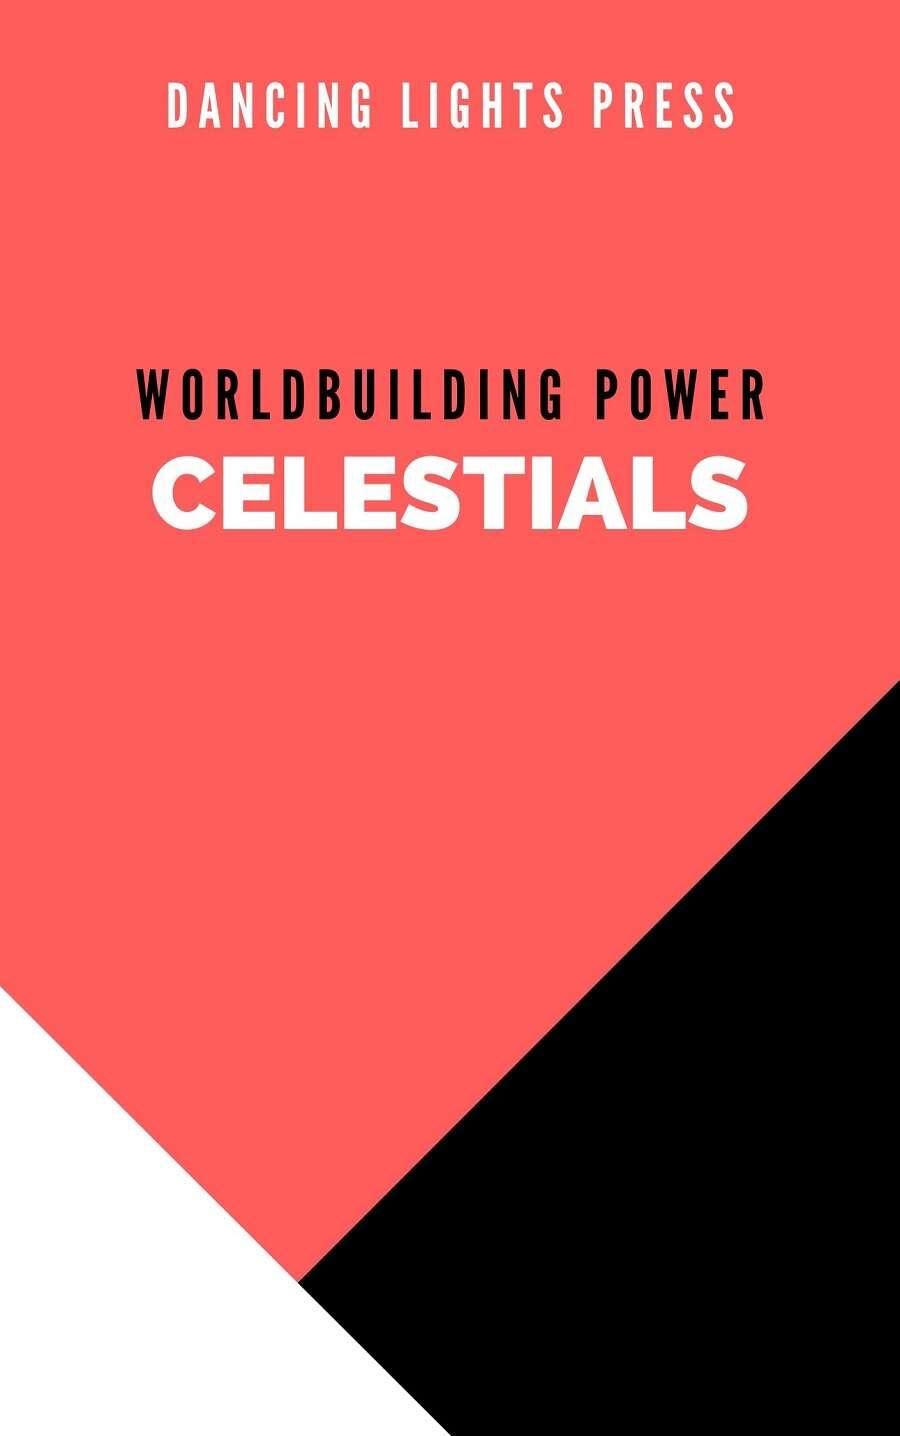 Worldbuilding Power: Celestials